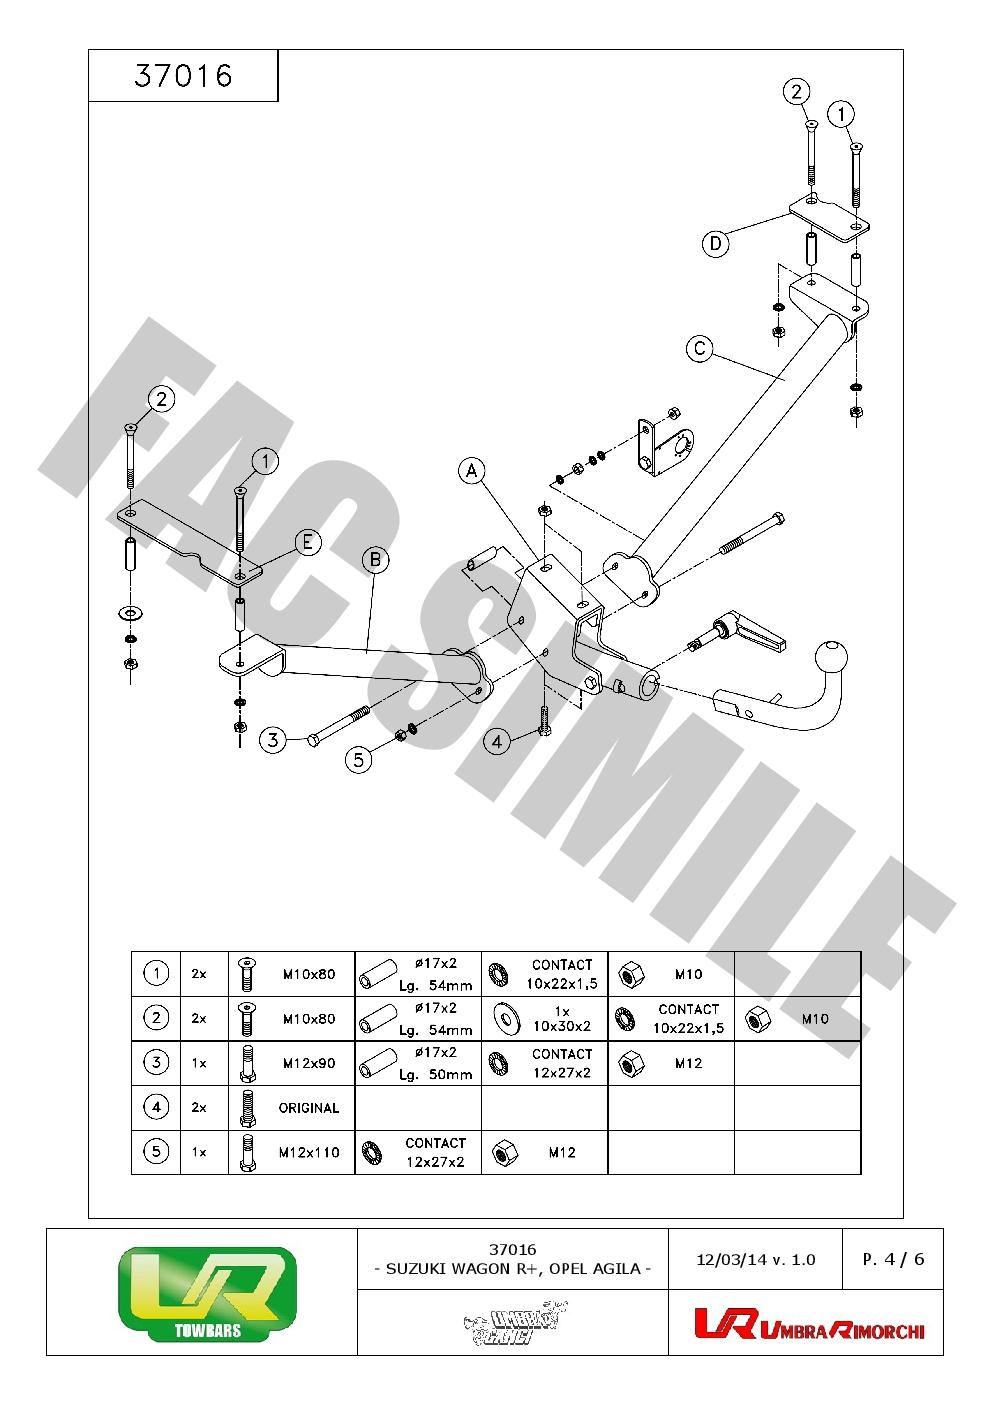 Detachable Towbar +7pin Wiring for Suzuki WAGON R+ 5seats